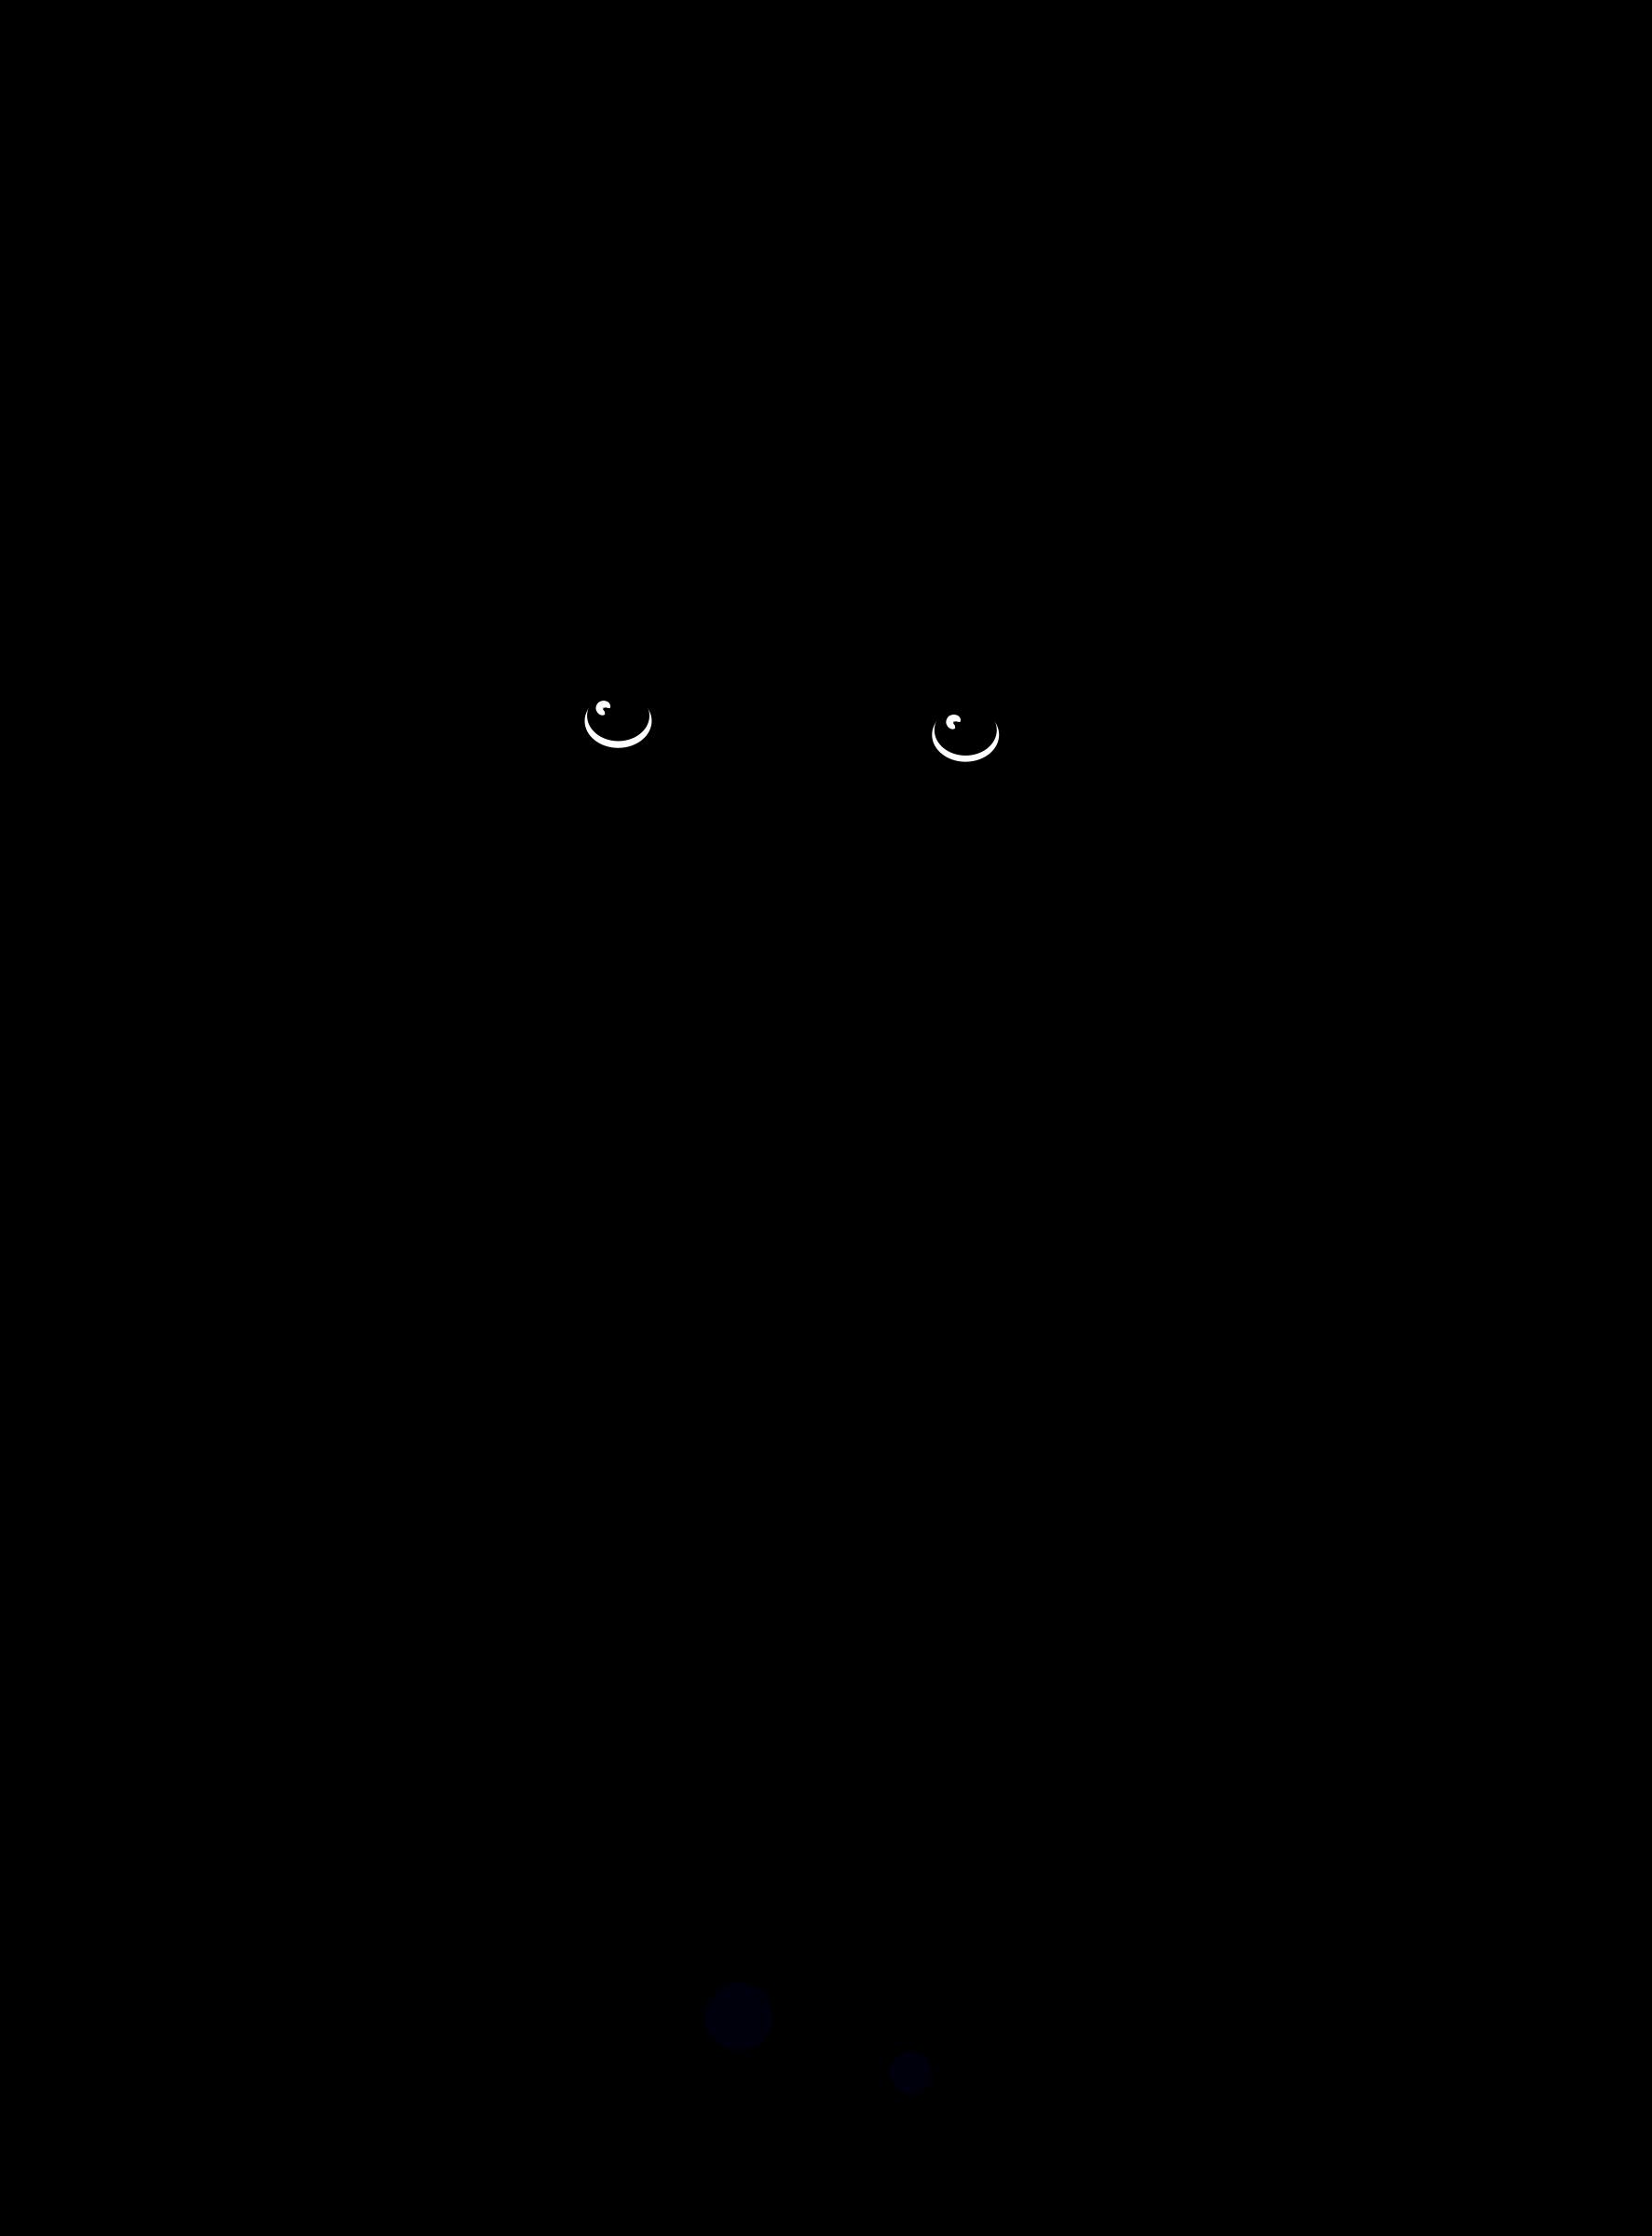 vector freeuse download Clipart thinking big image. Drawing necks man